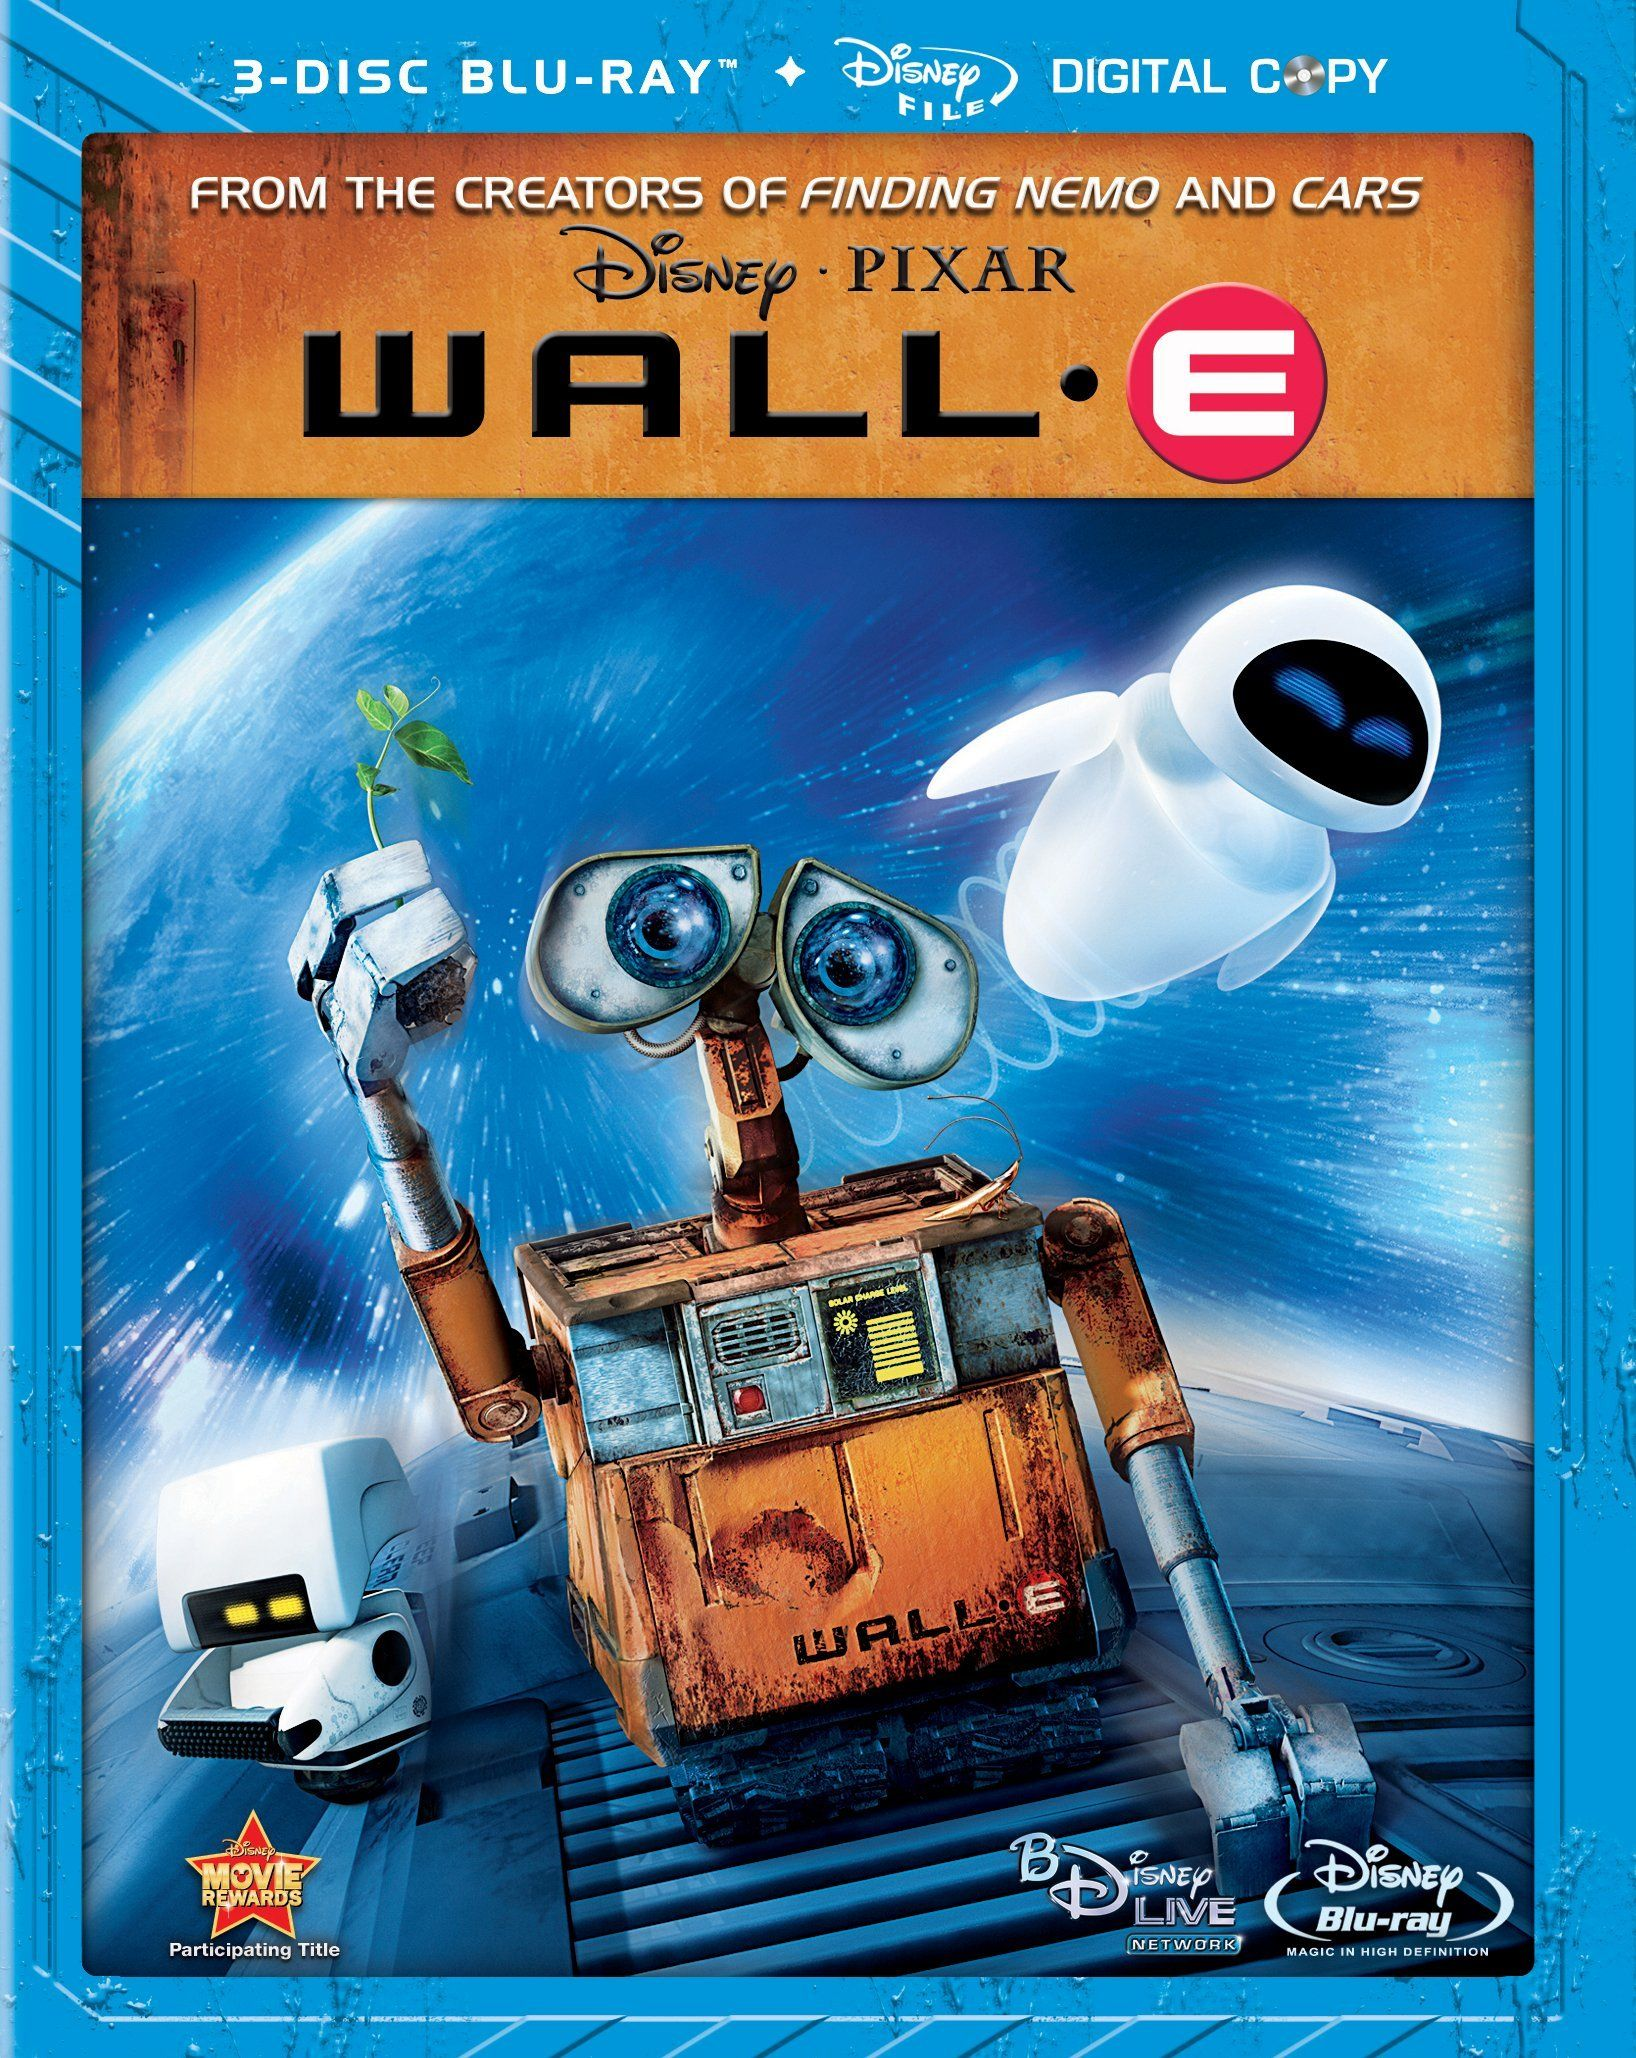 WALL•E Bluray WALLE 3disc PIXAR Wall e movie